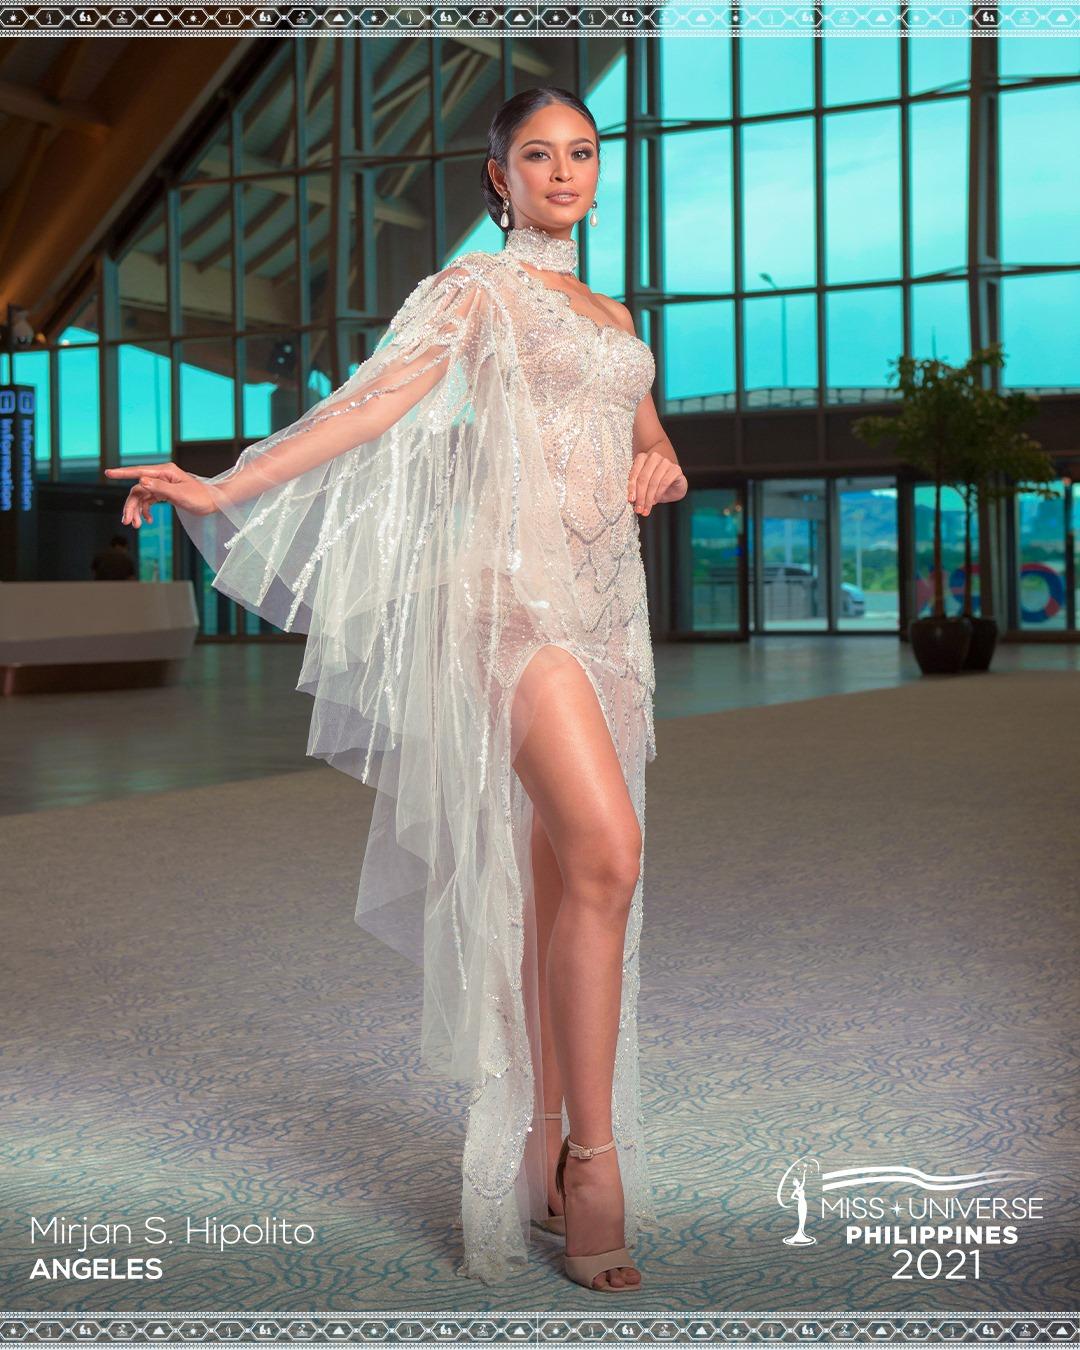 miss-universe-mirjan-hipolito-angeles-evening-gown